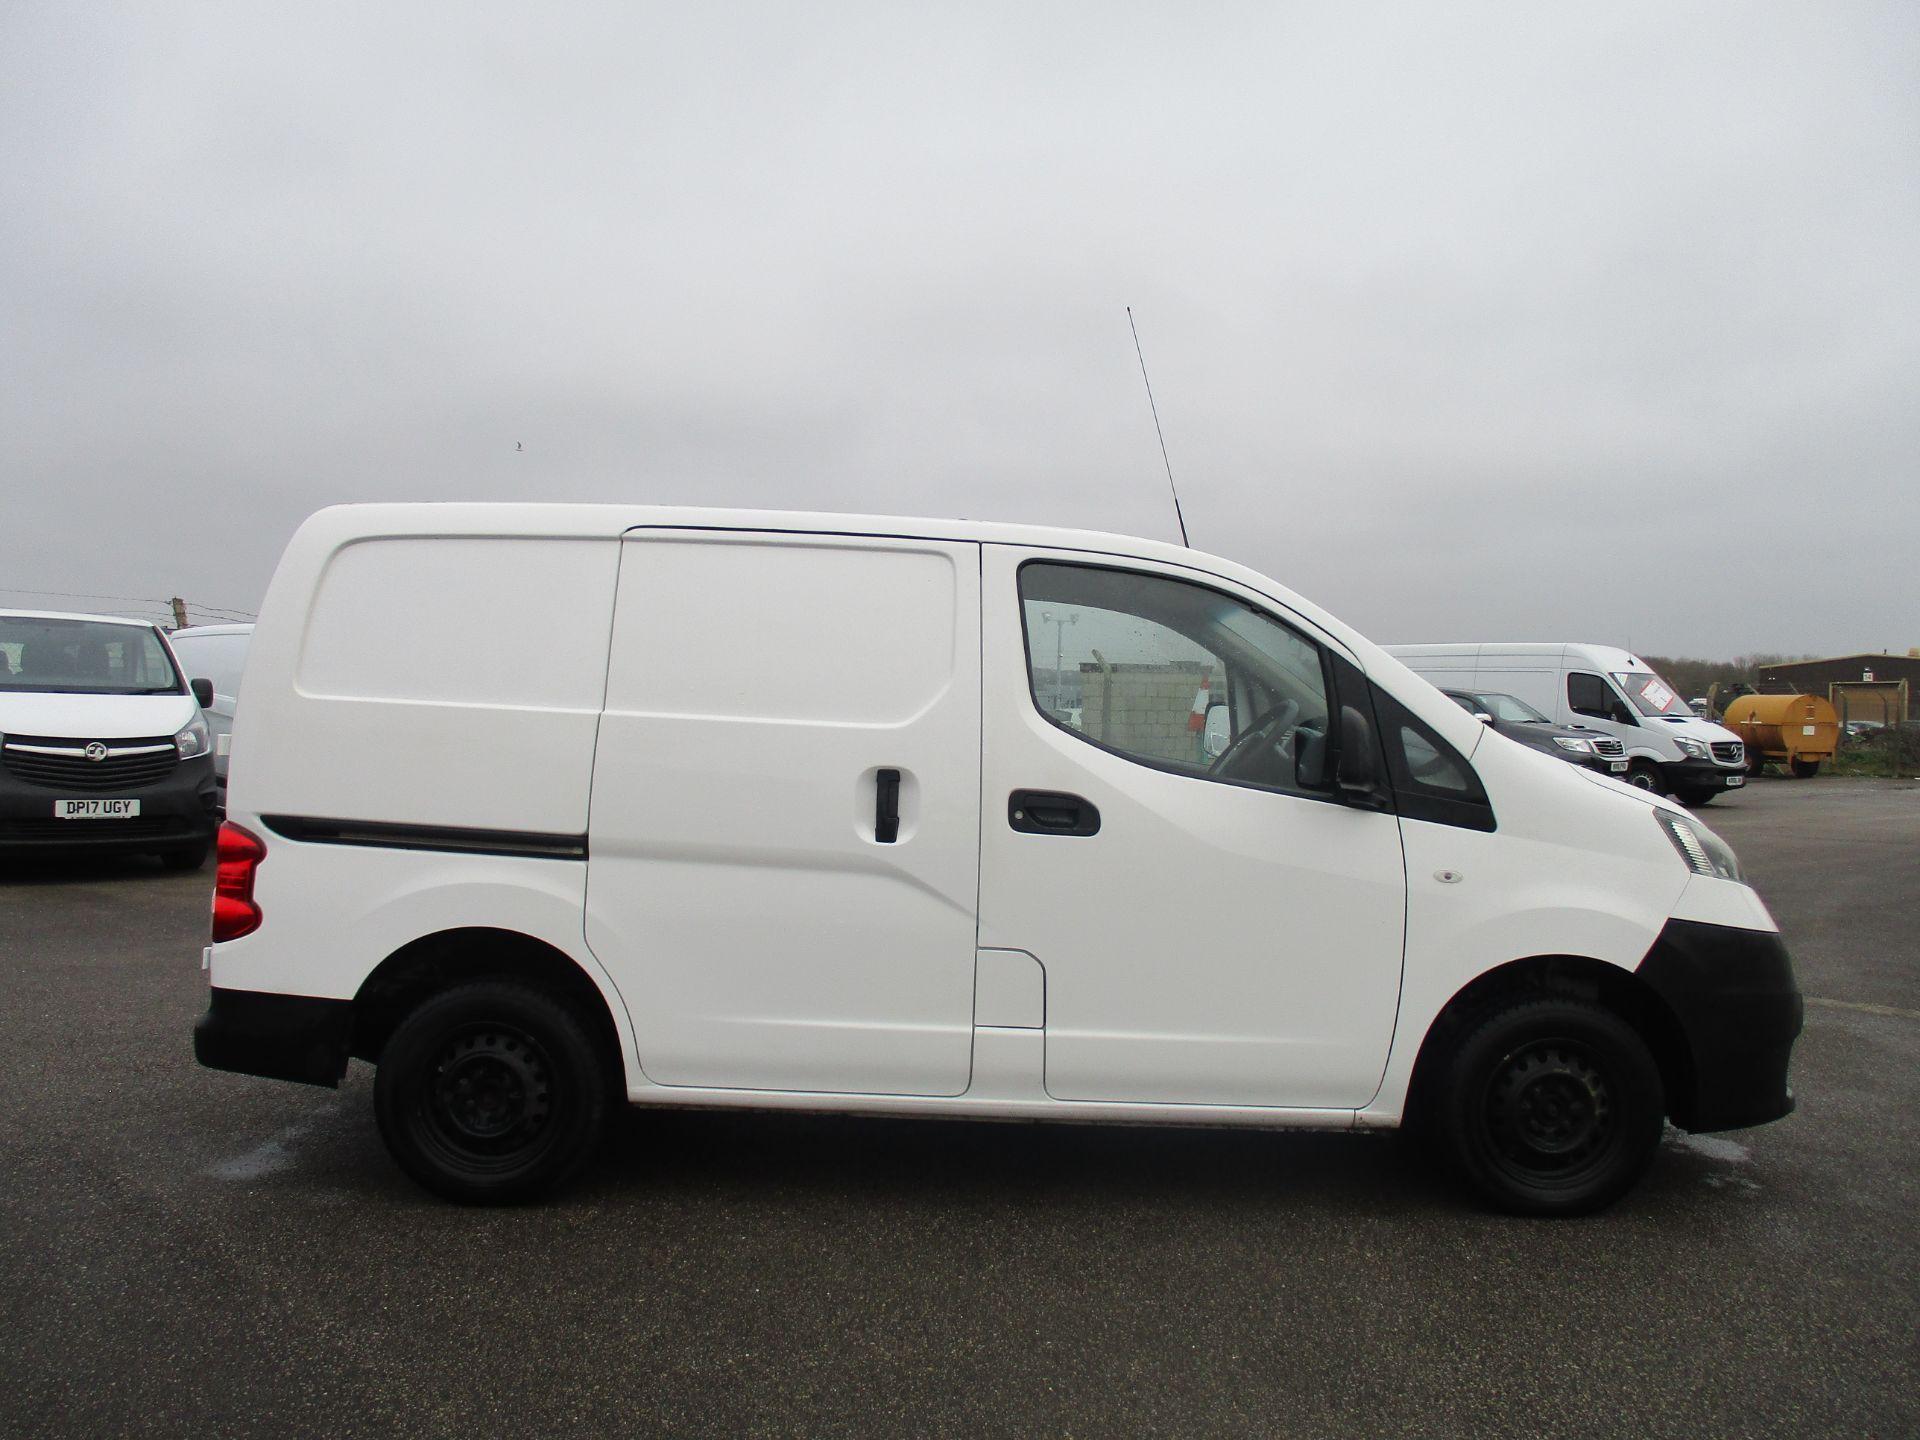 2014 Nissan Nv200 1.5 DCI ACENTA EURO 5 (SJ14YBR) Image 4